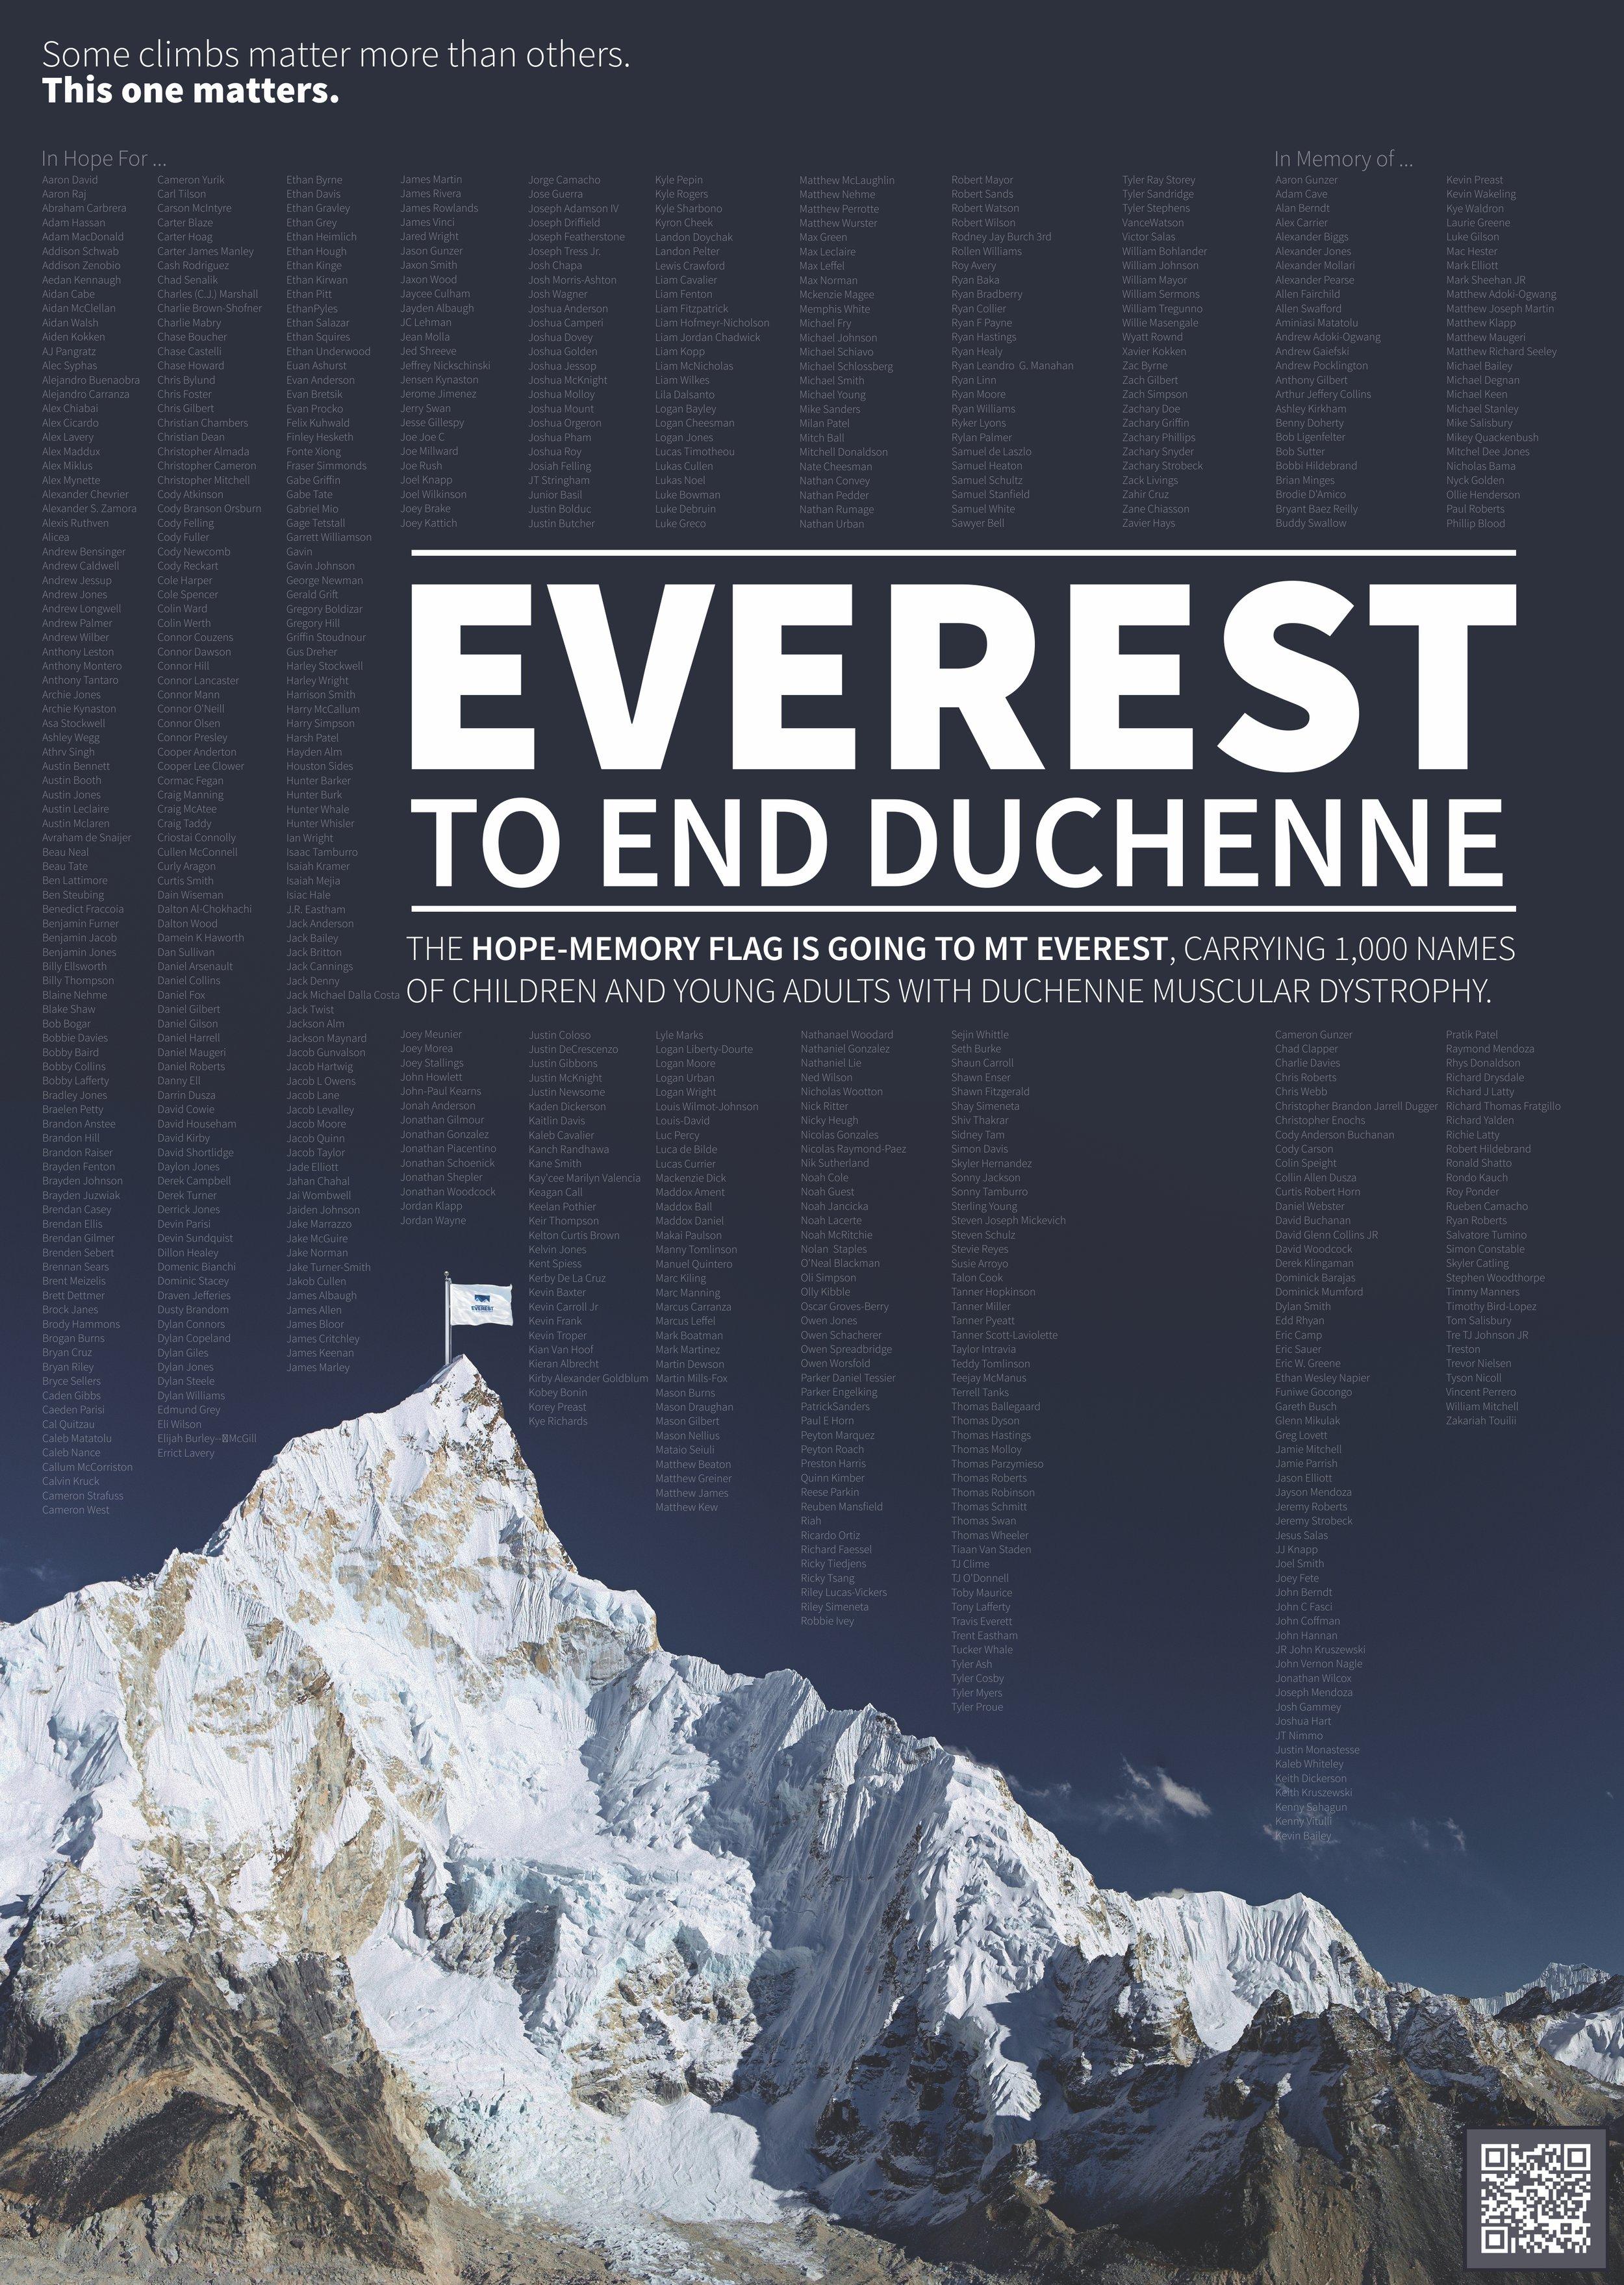 EverestPoster 3.0.jpg